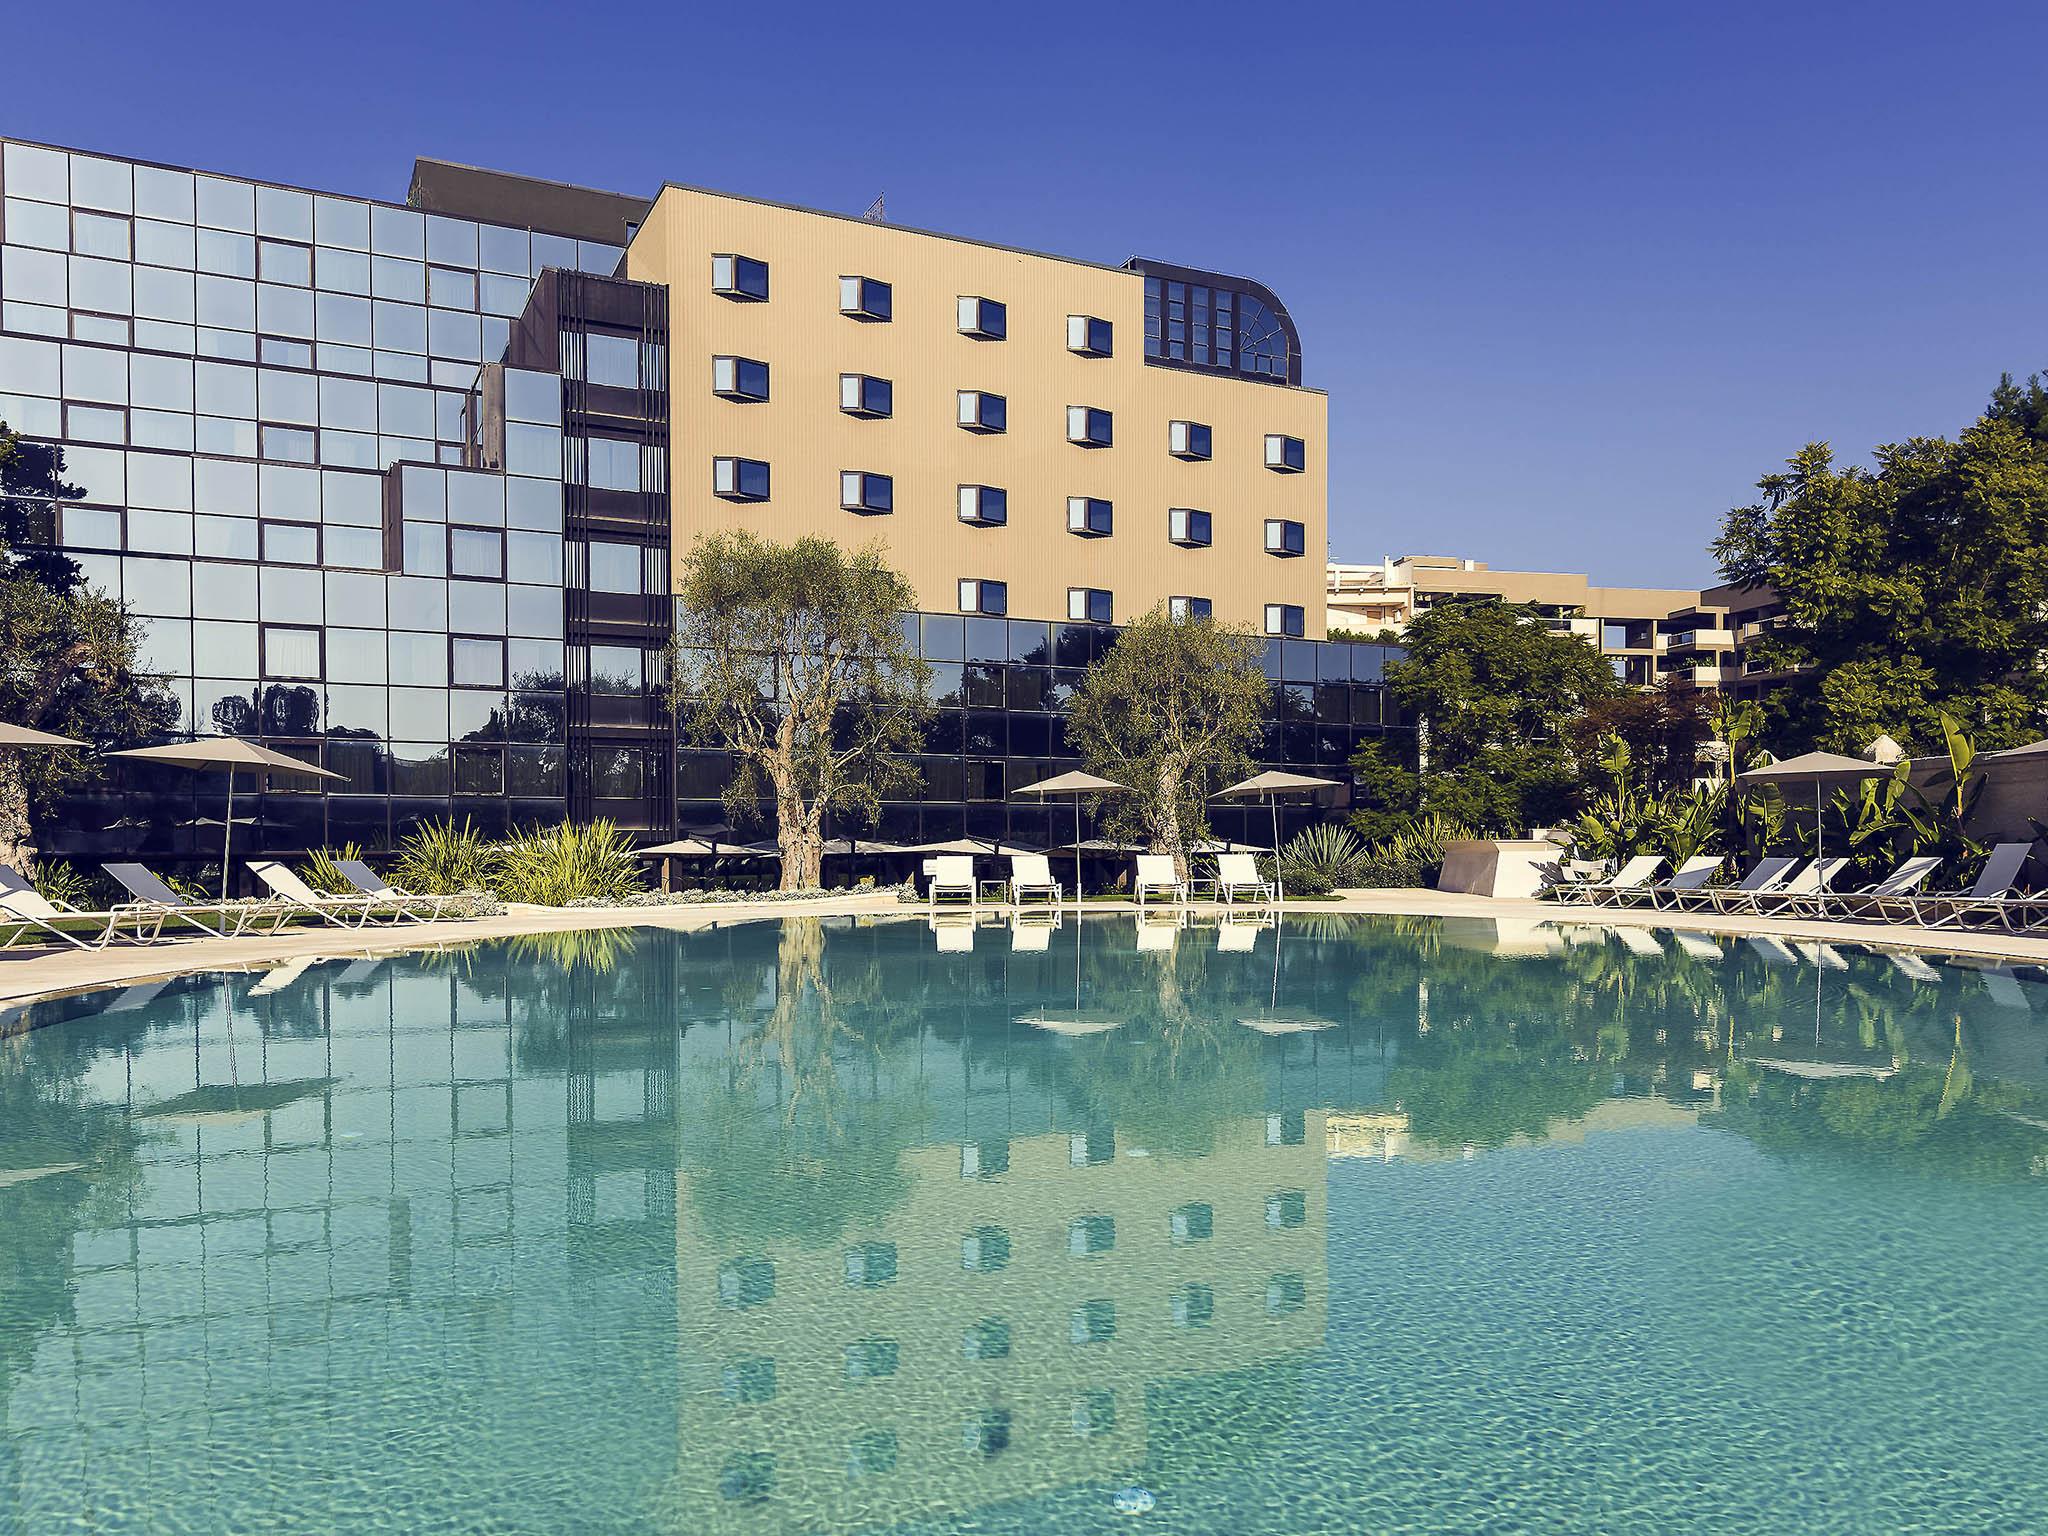 فندق - Mercure Villa Romanazzi Carducci Bari